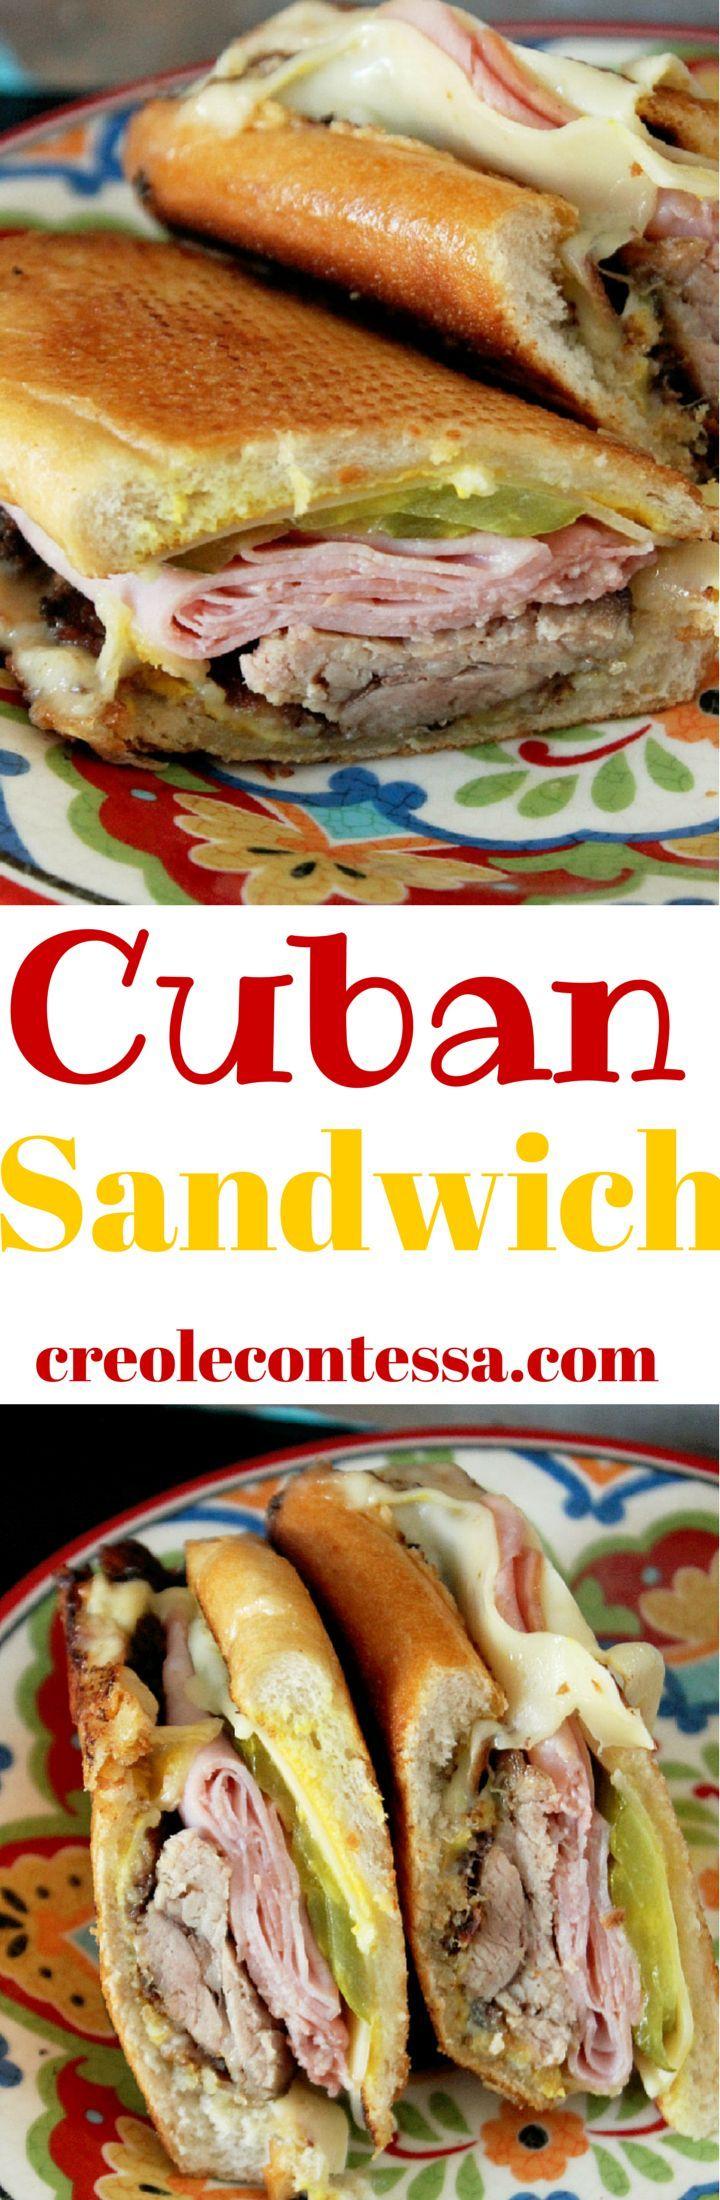 Roasted Pork Cuban Sandwich -Creole Contessa